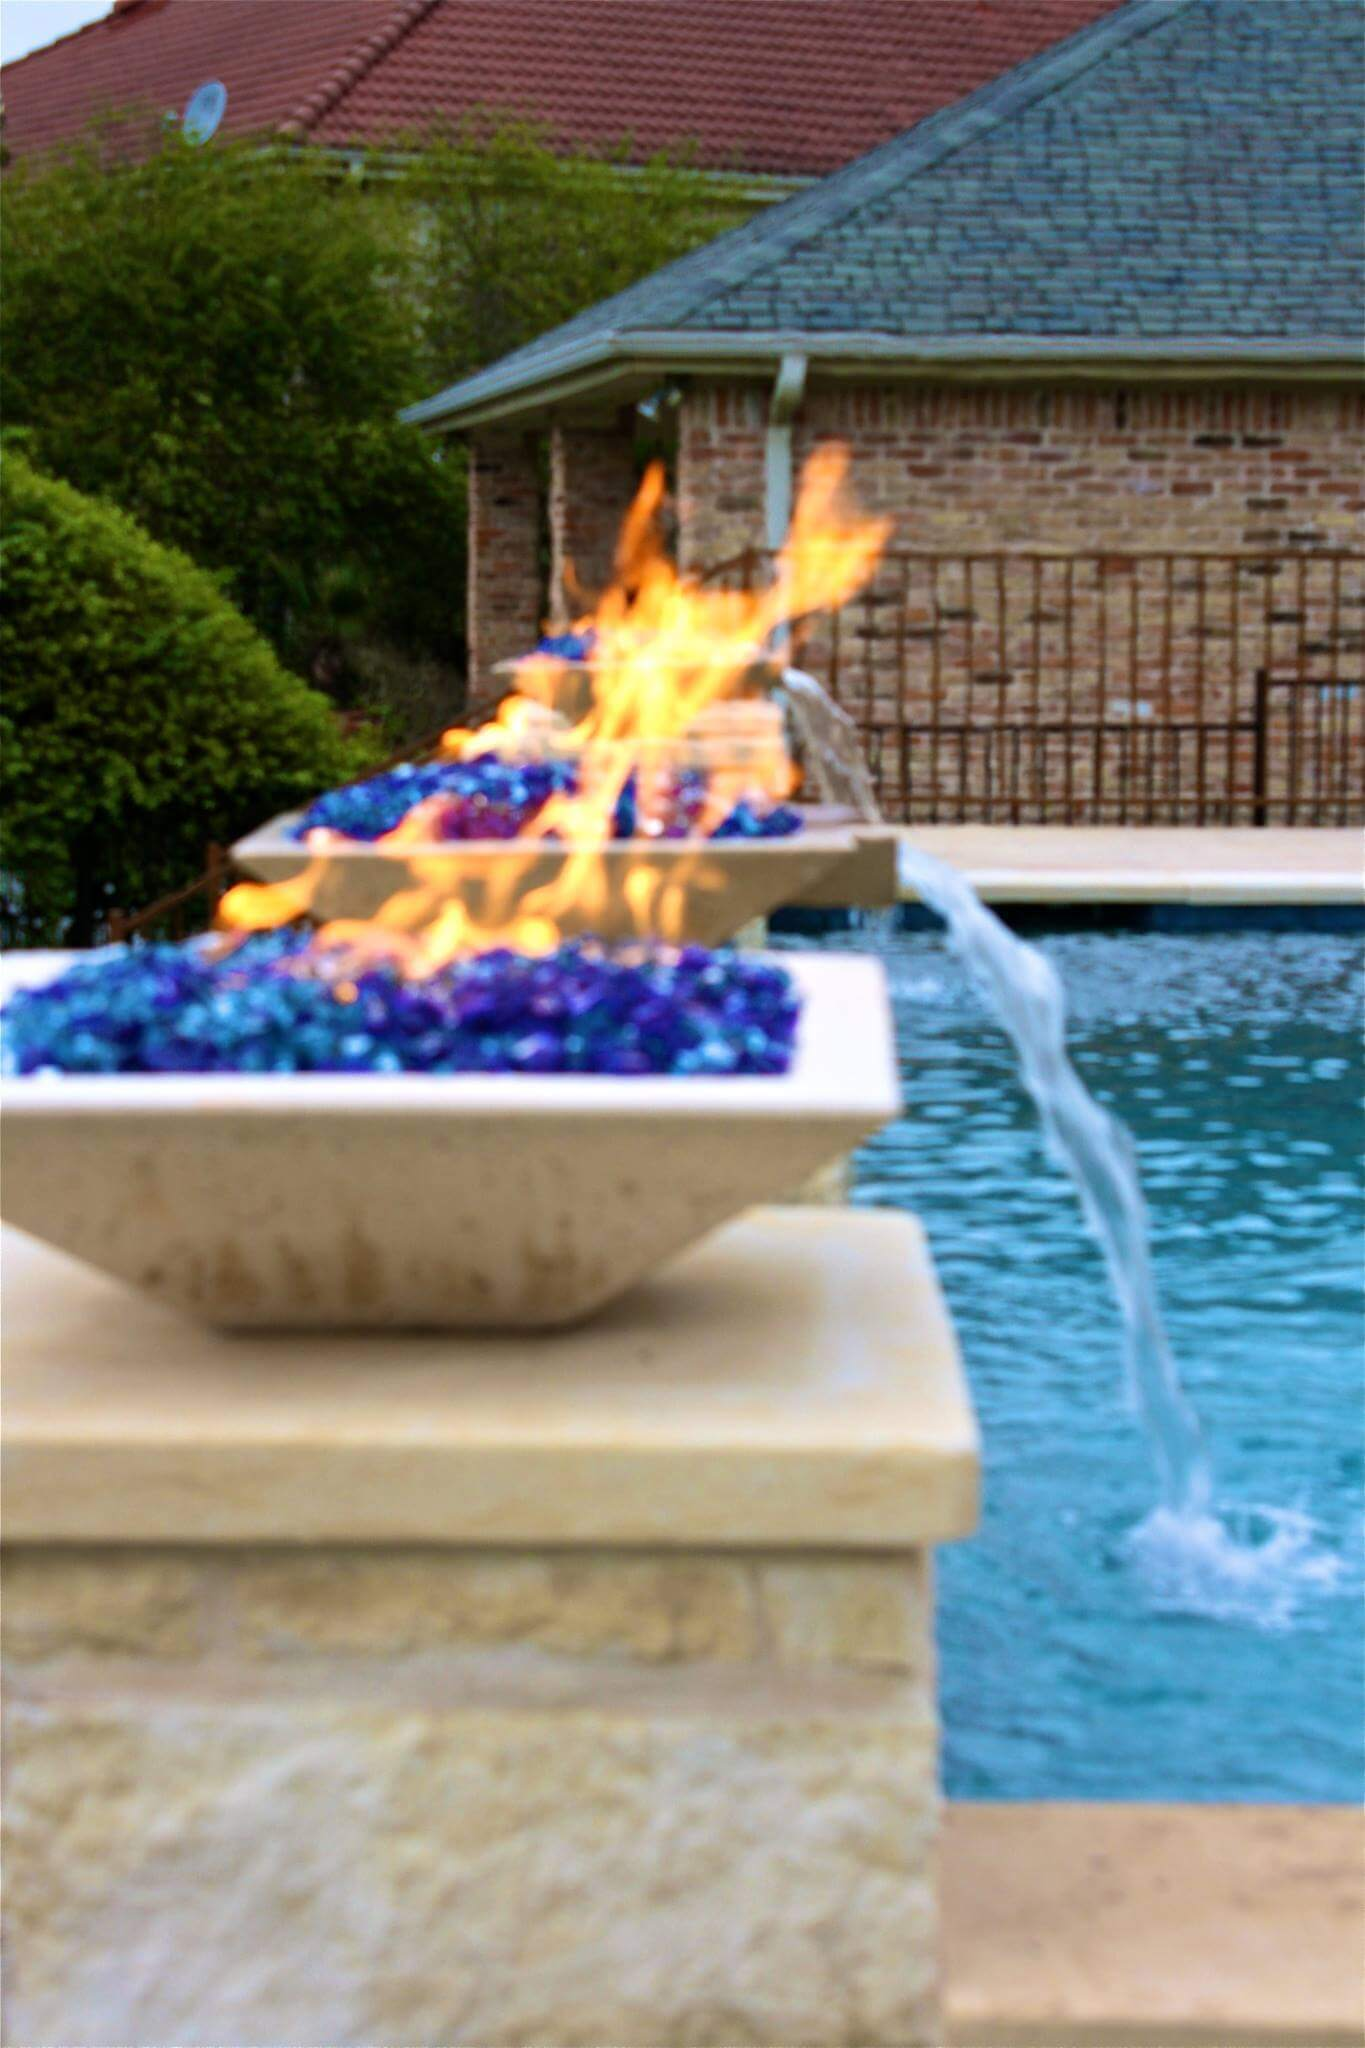 Backyard Fire Features in Inground Pool - Austin Pool Builders